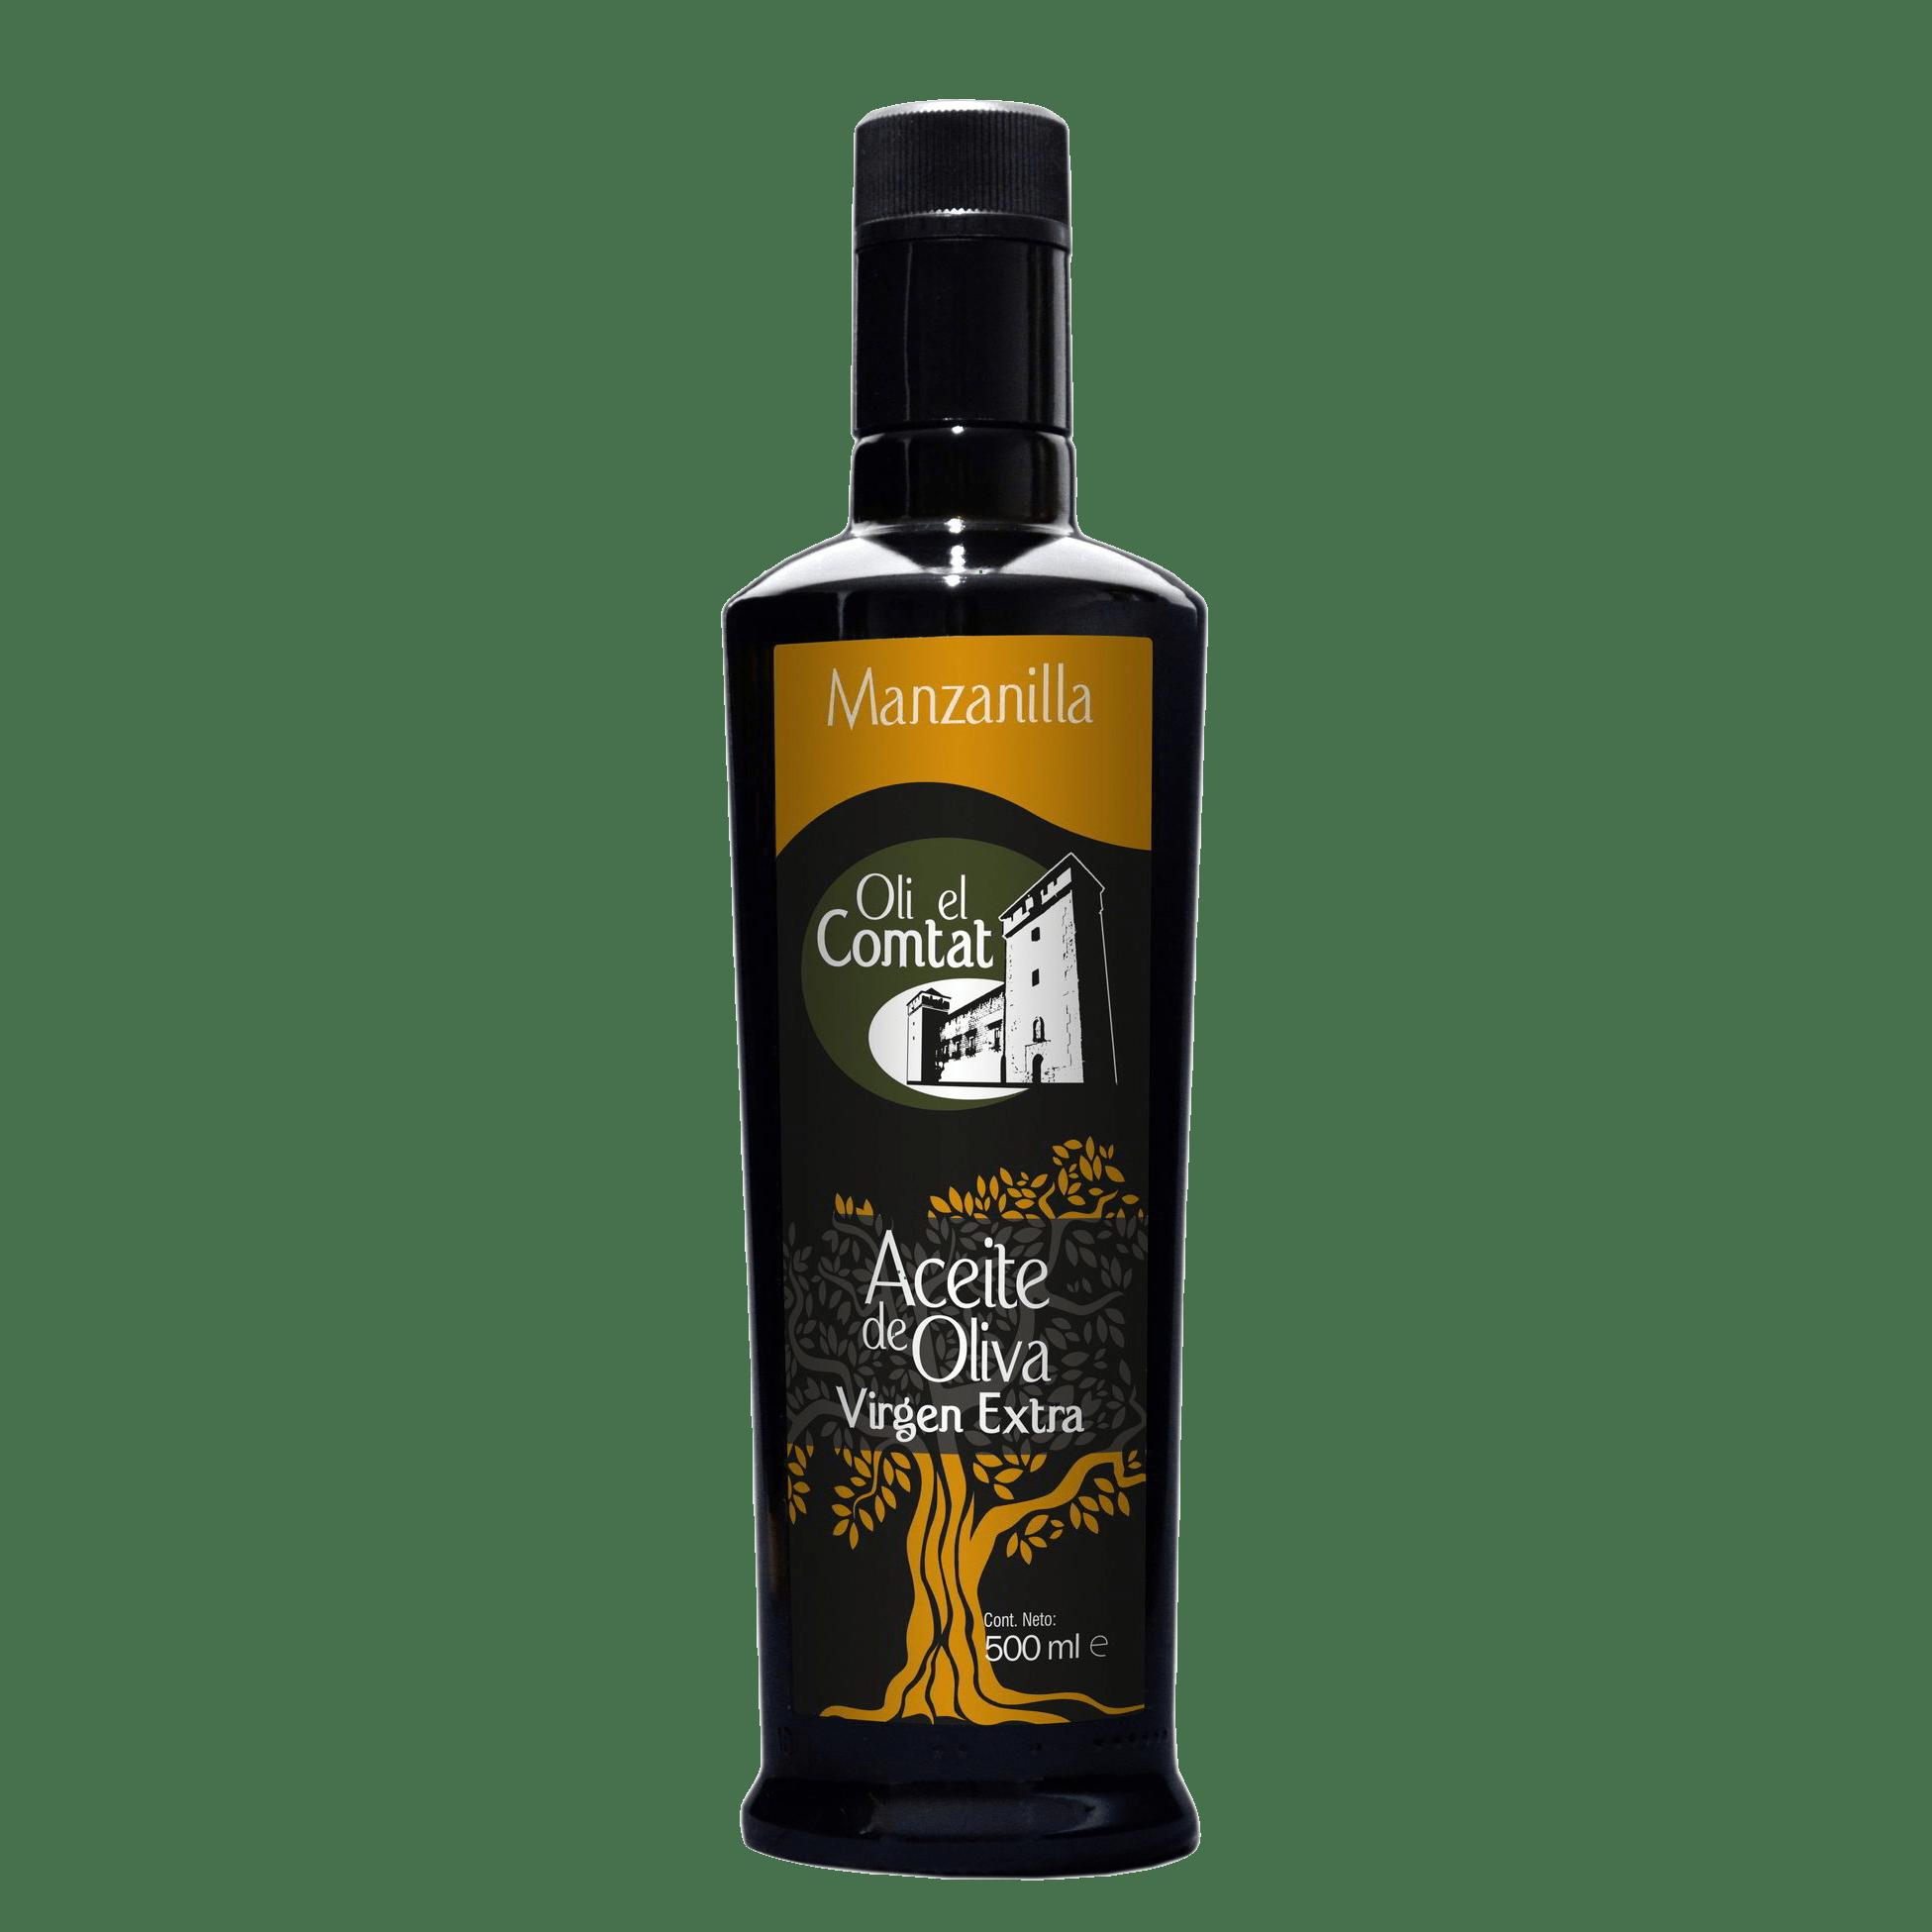 Aceite_ de_oliva_virgen_extra_manzanilla_500ml